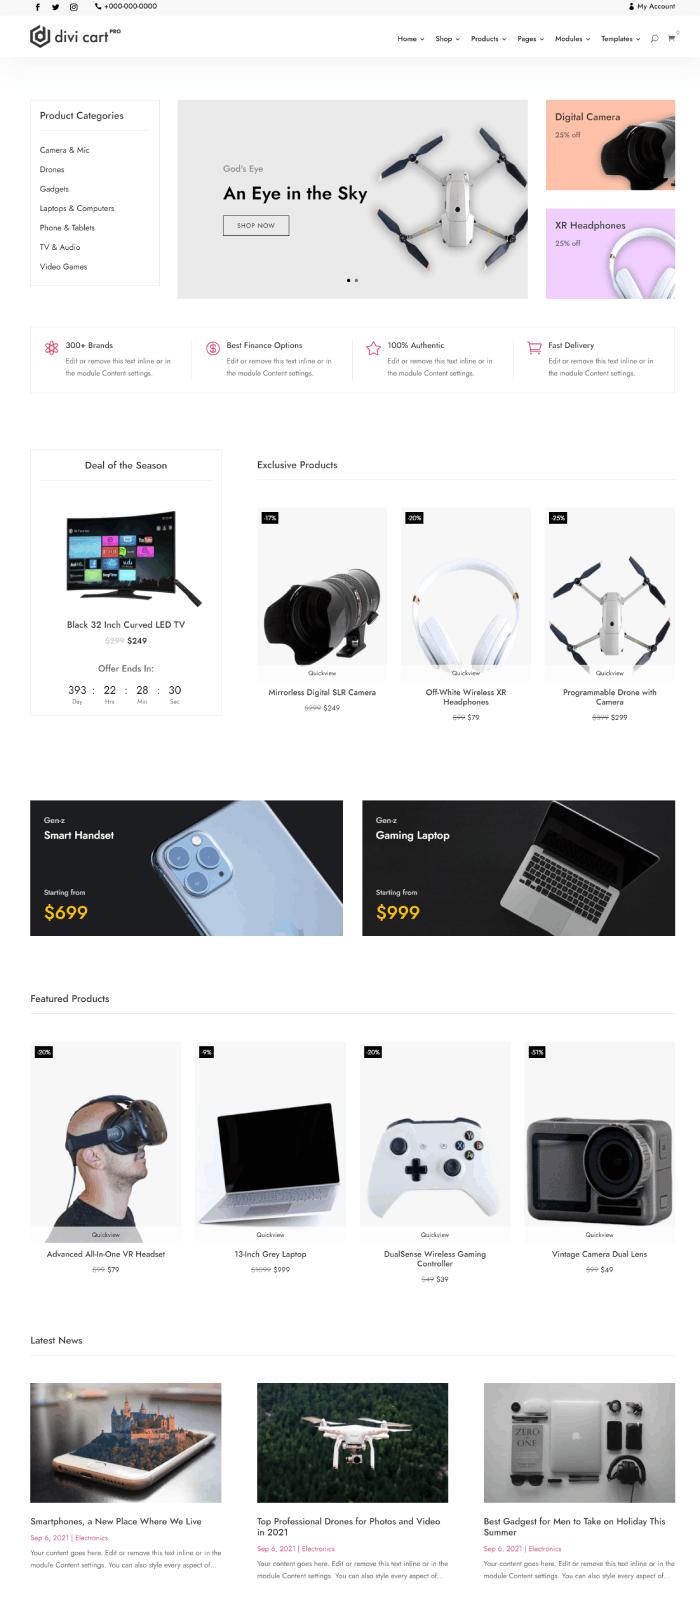 Divi Cart Pro Electronics homepage